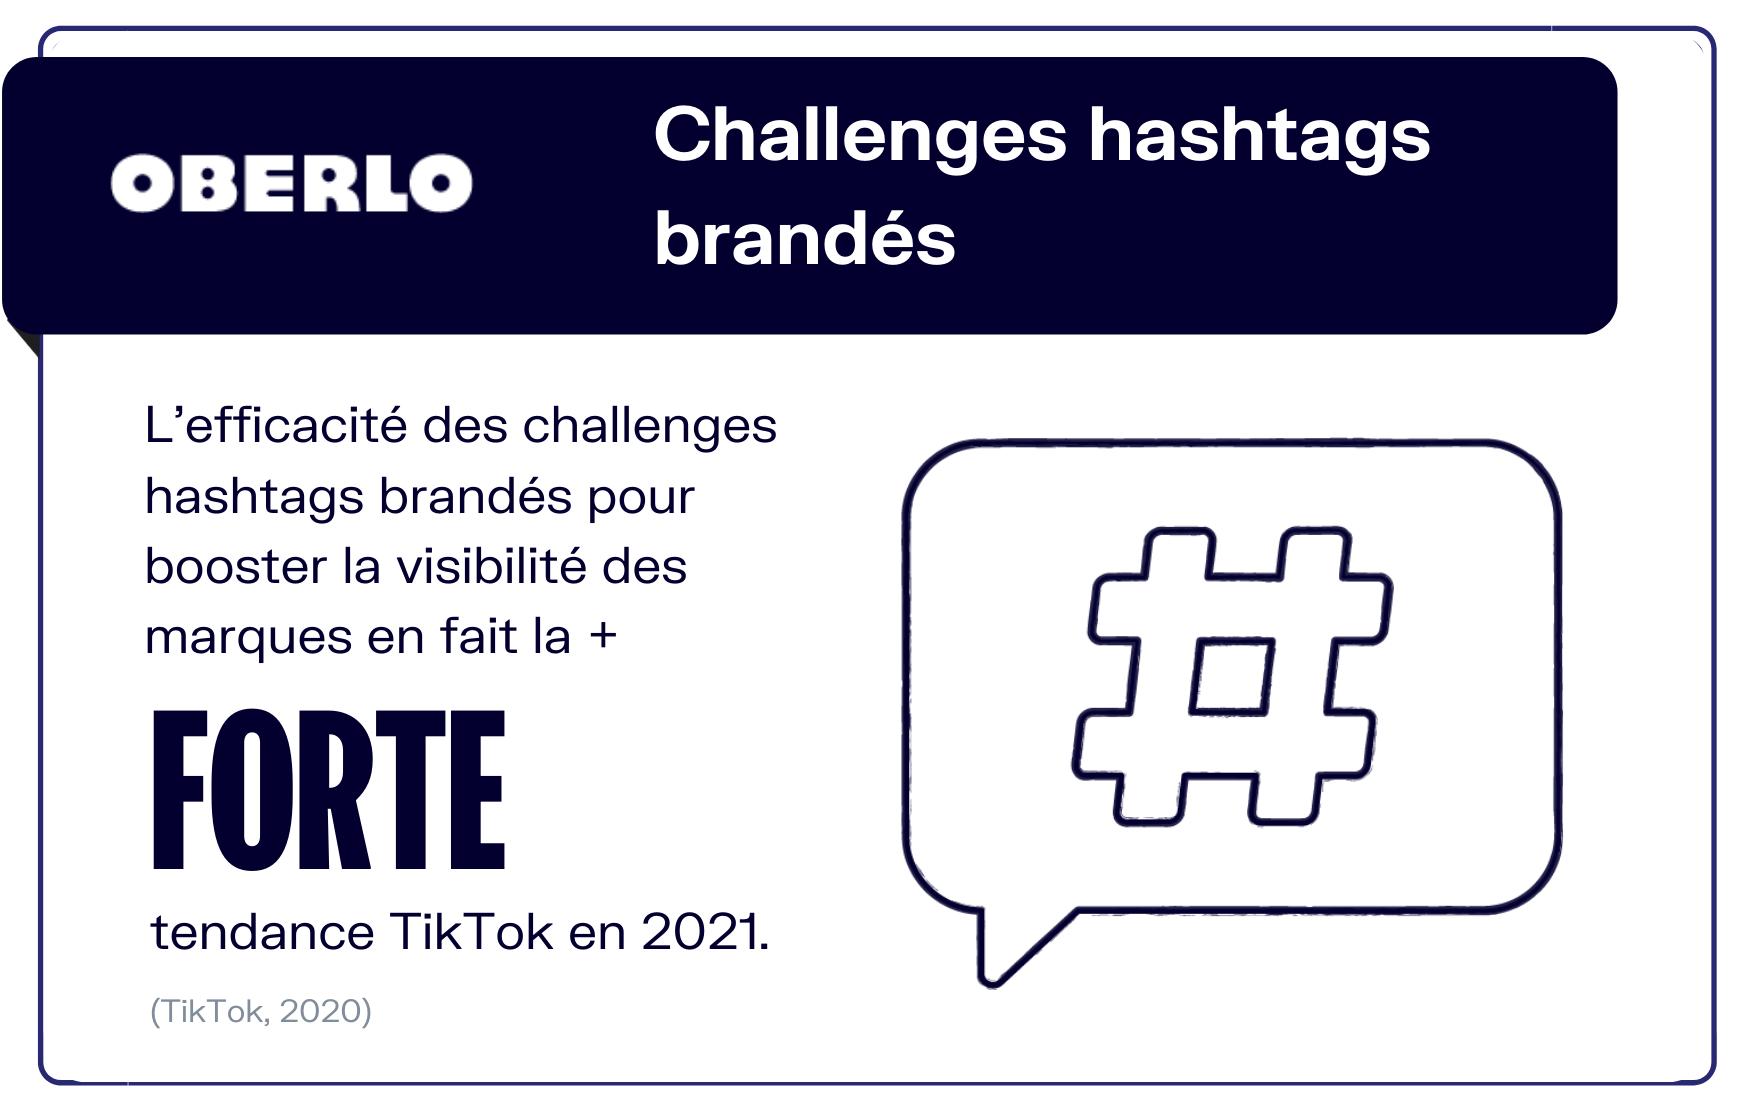 Tik Tok tendance 2021 challenges